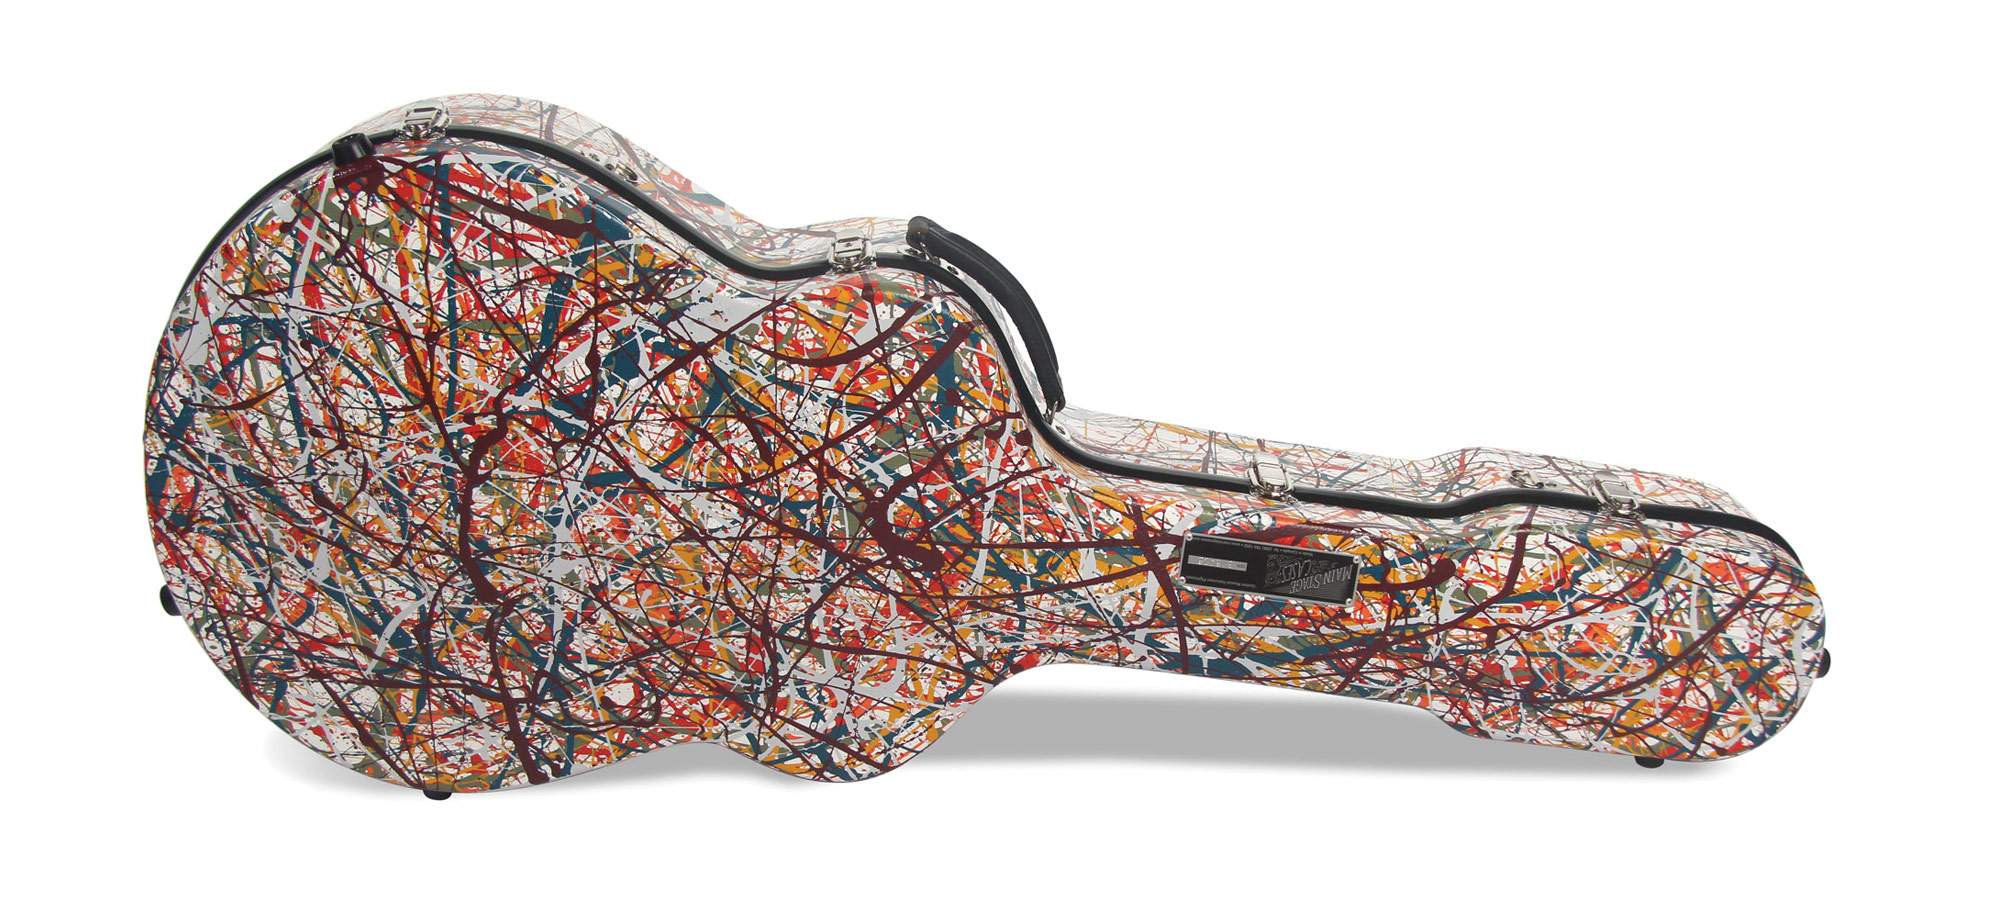 mainstage-guitar-colours